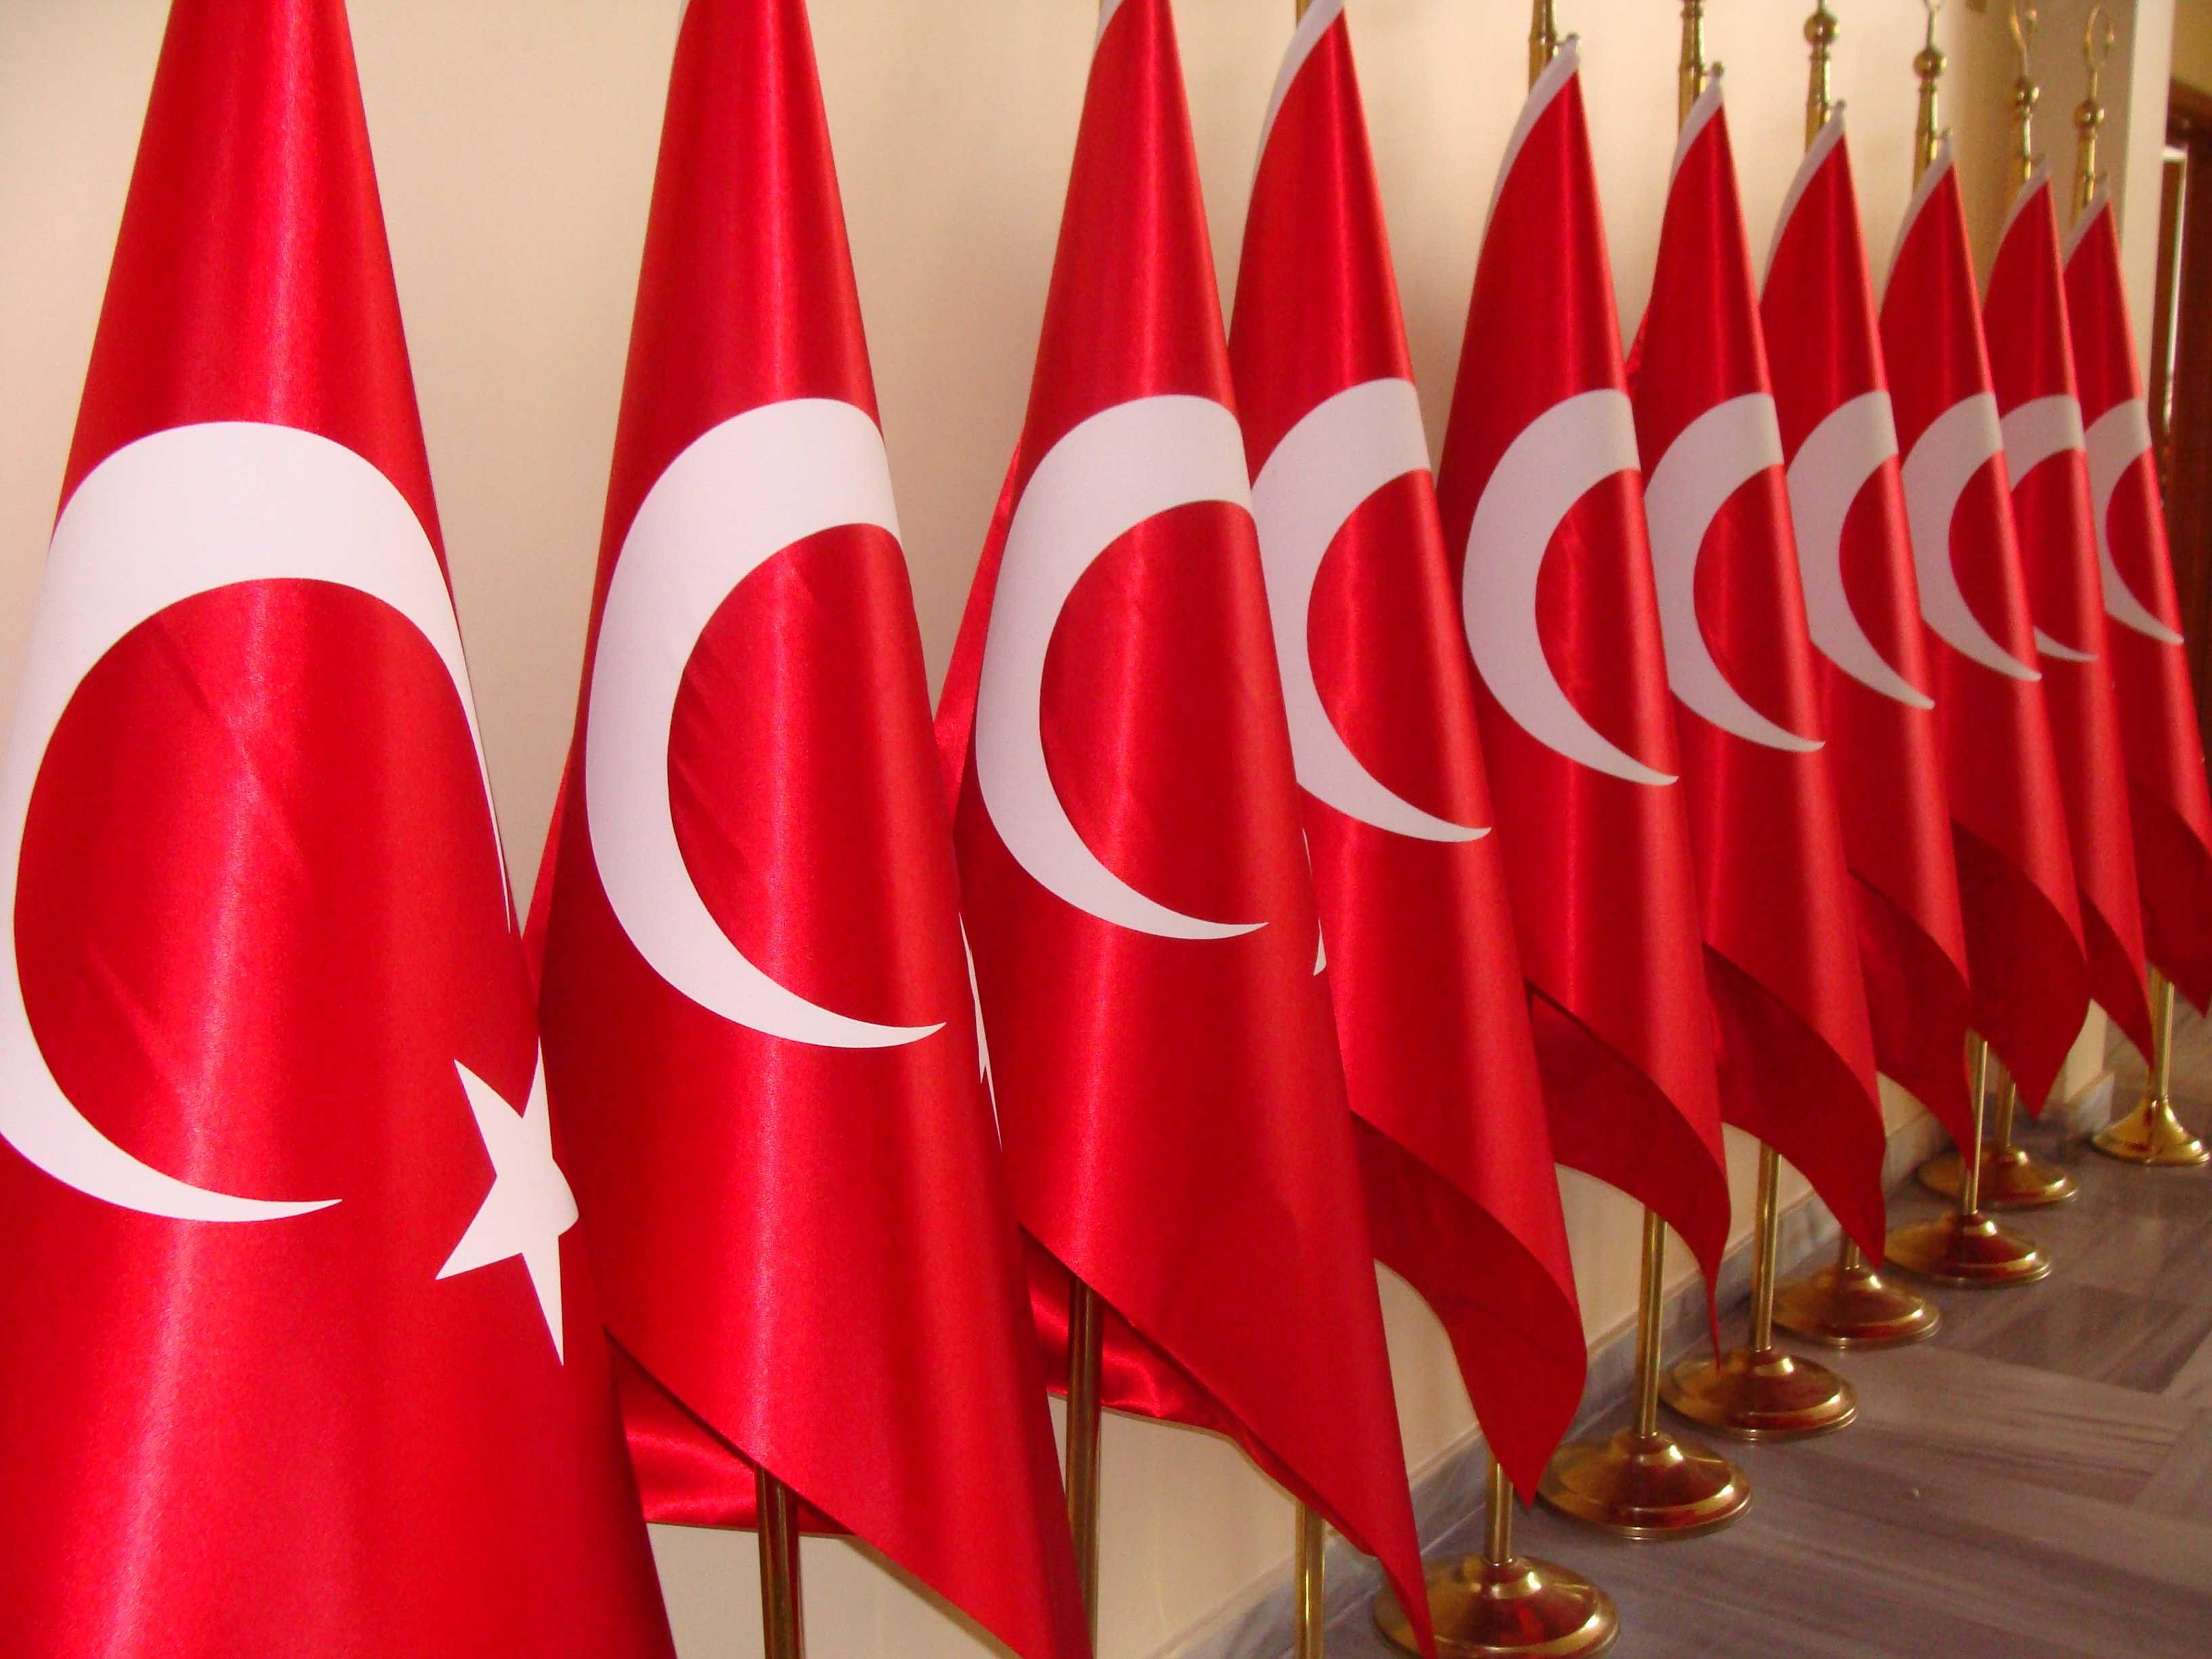 Türk Bayrağı 4k wallpaper